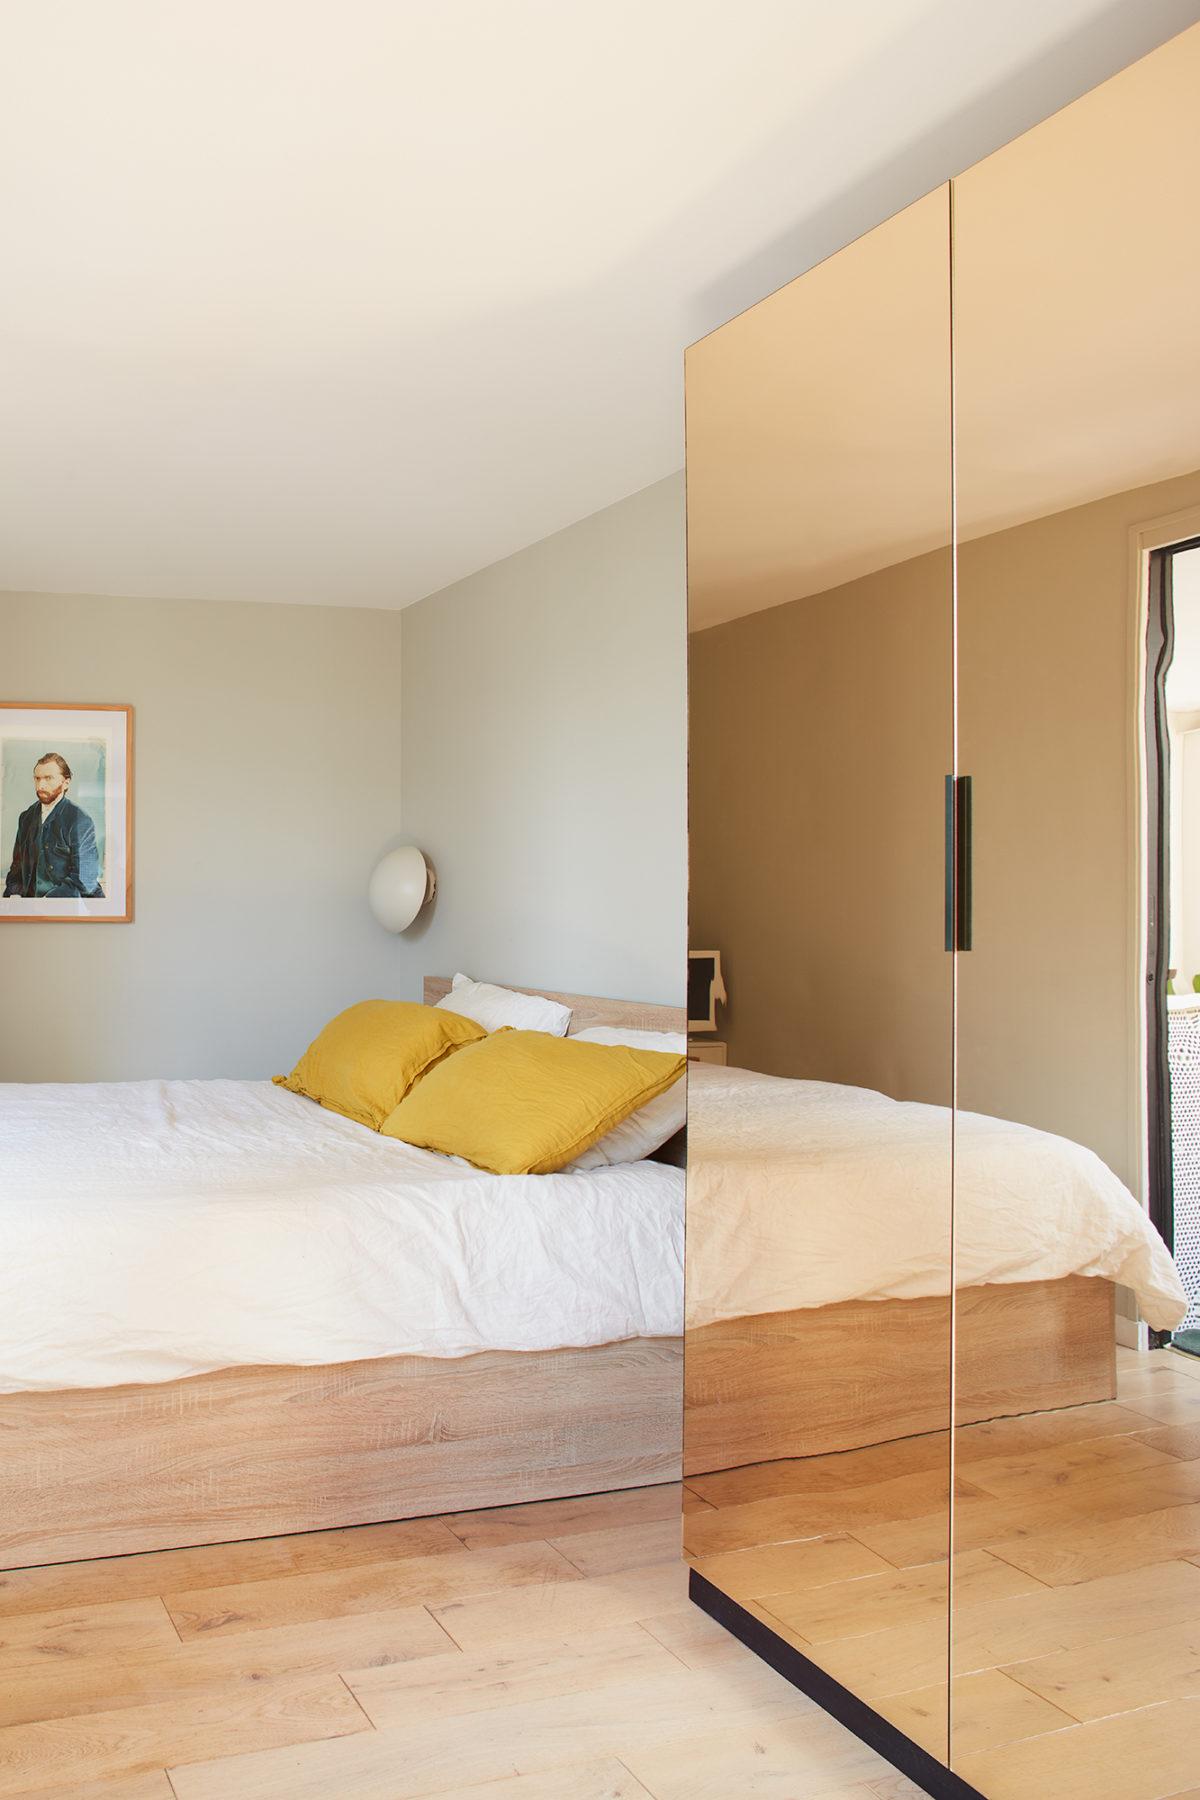 Chambre - Armoire ikea custom, miroir bronze, applique Louis Poulsen, peinture Van Gogh par Tadao Cern